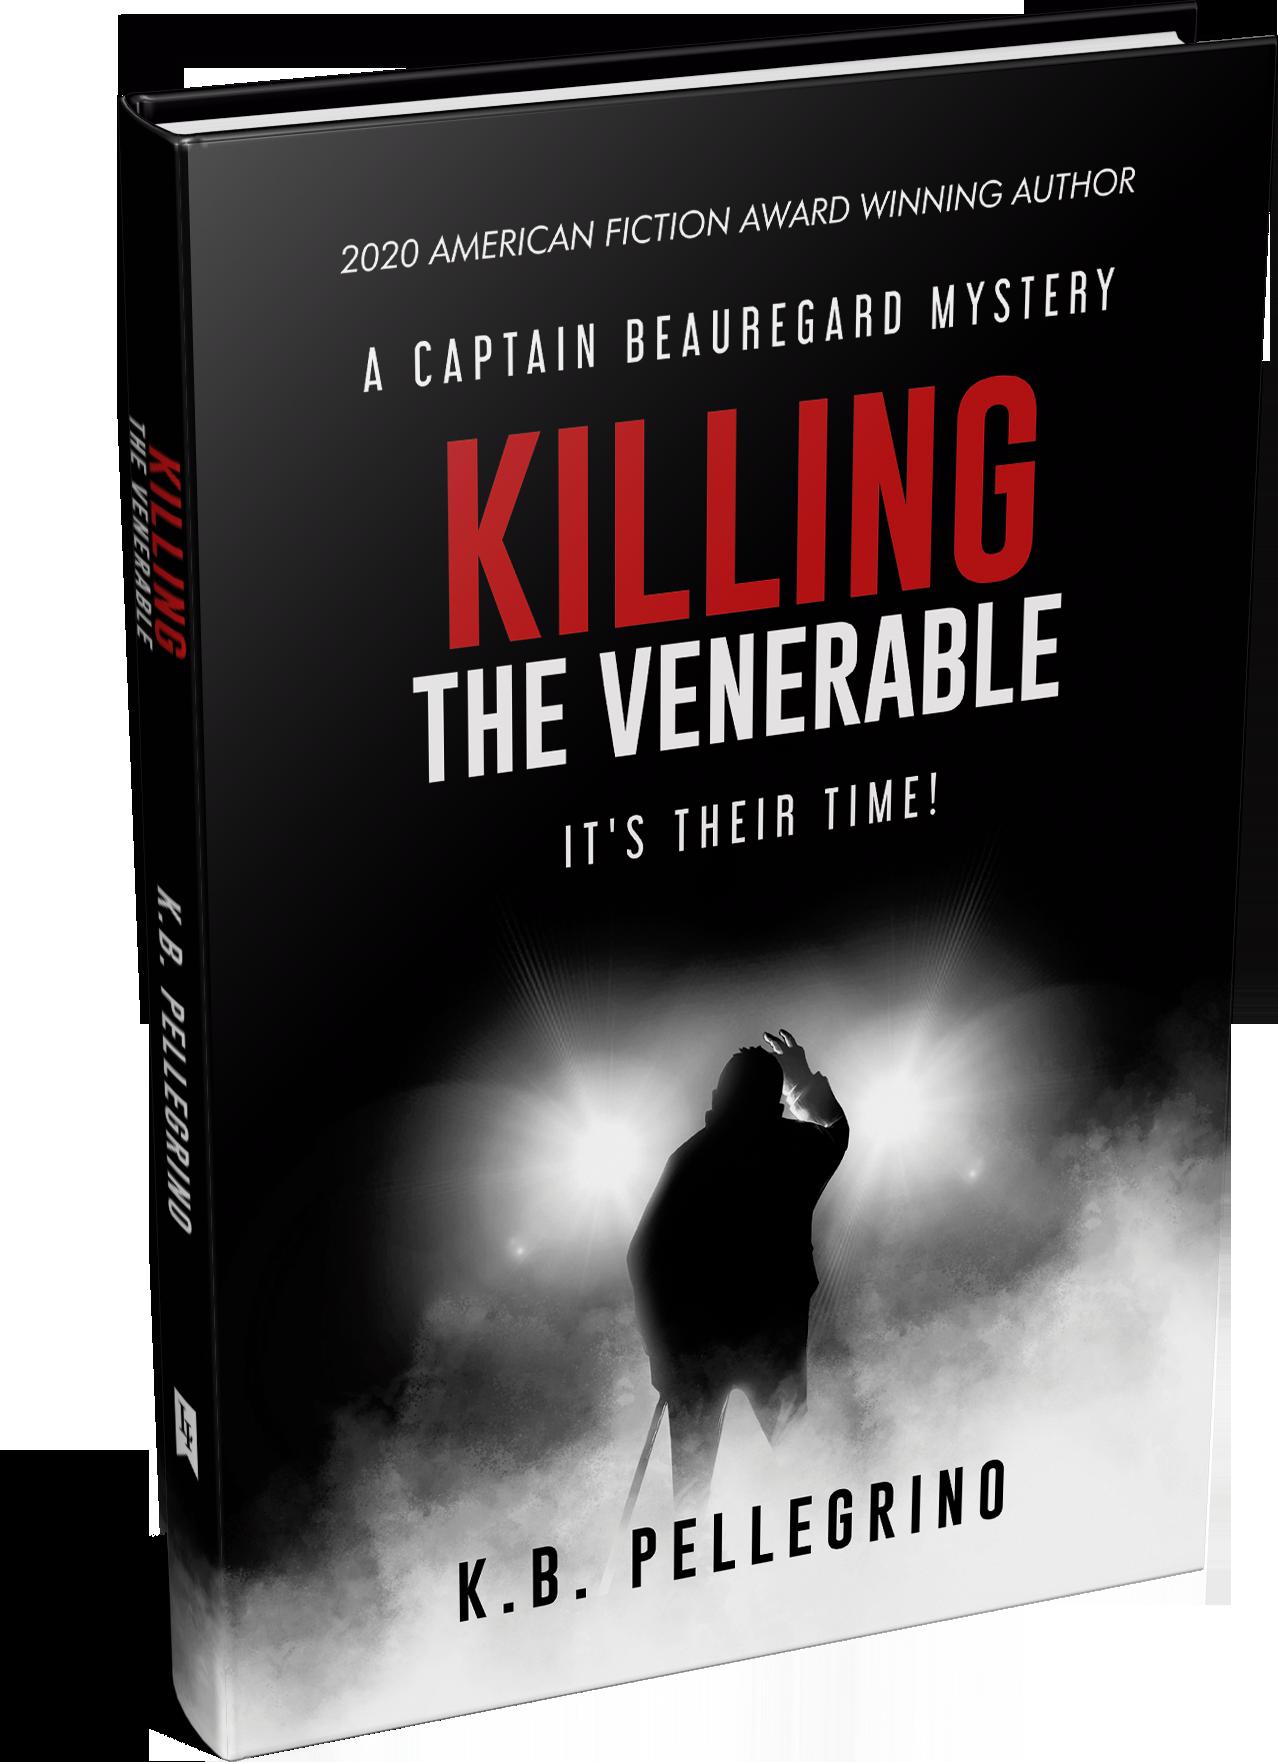 Killing-The-Venerable by K.B. Pellegrino